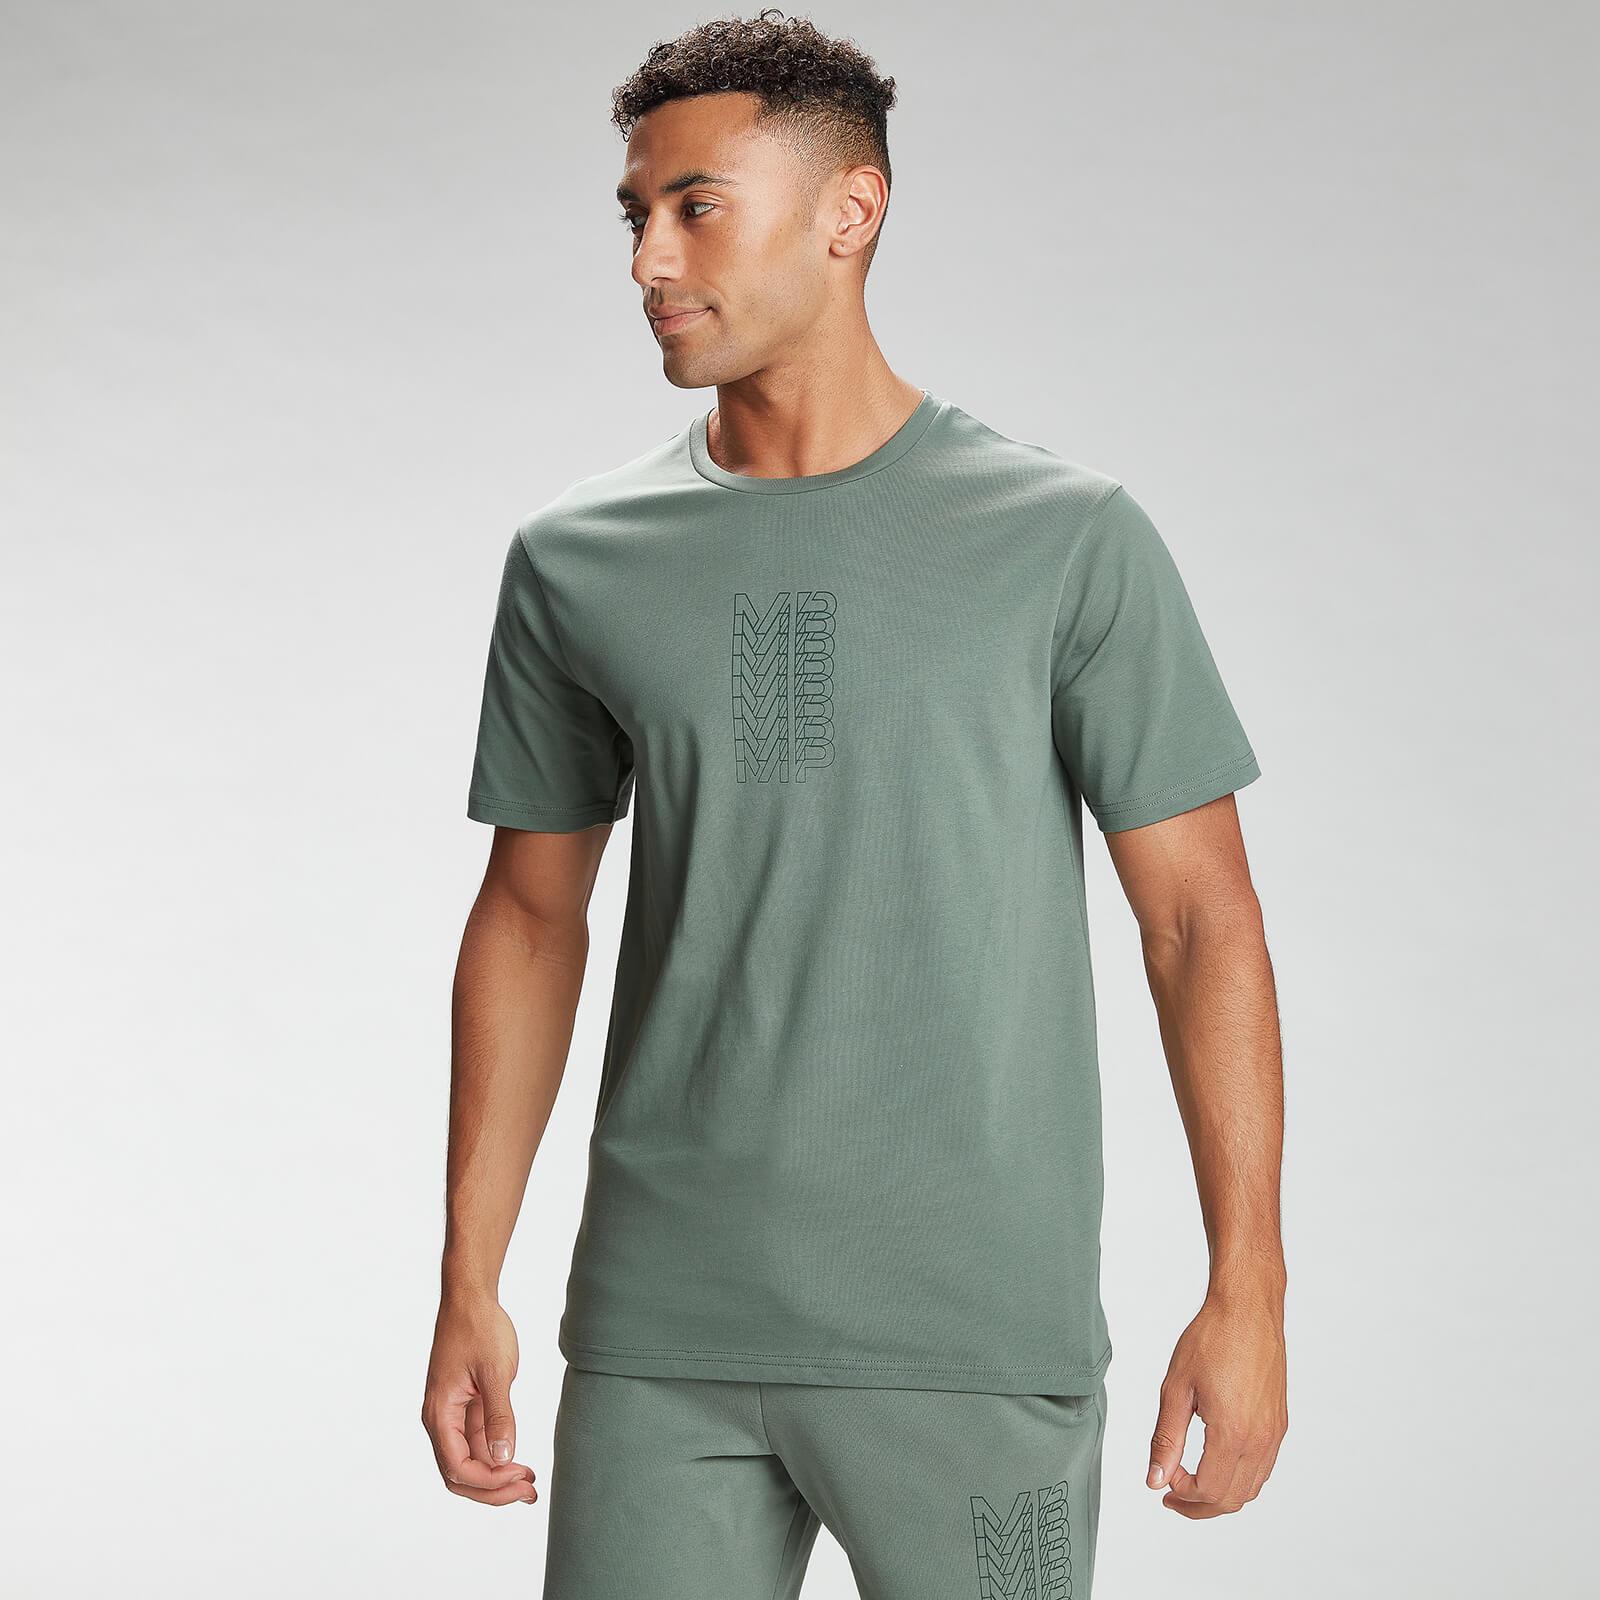 Купить MP Men's Repeat MP Graphic Short Sleeve T-Shirt - Cactus - XL, Myprotein International